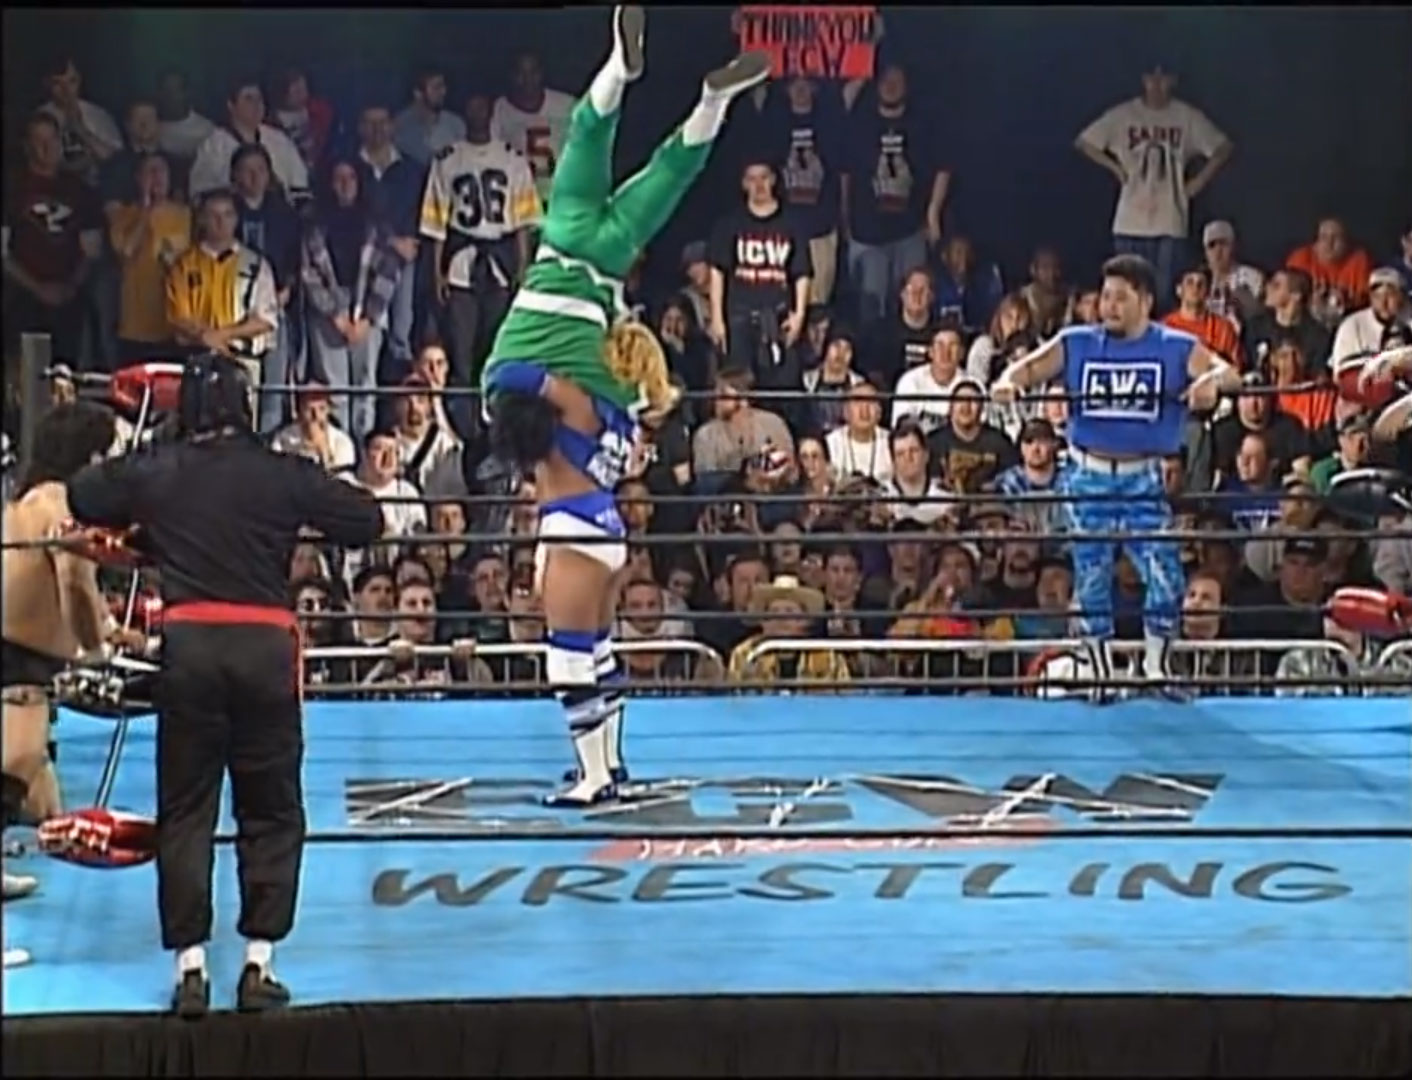 Gran Hamada & Masato Yakushiji & The Great Sasuke vs. Dick Togo & TAKA Michinoku & Terry Boy 6-Person Tag, ECW Barley Legal  Apr 13th 1997